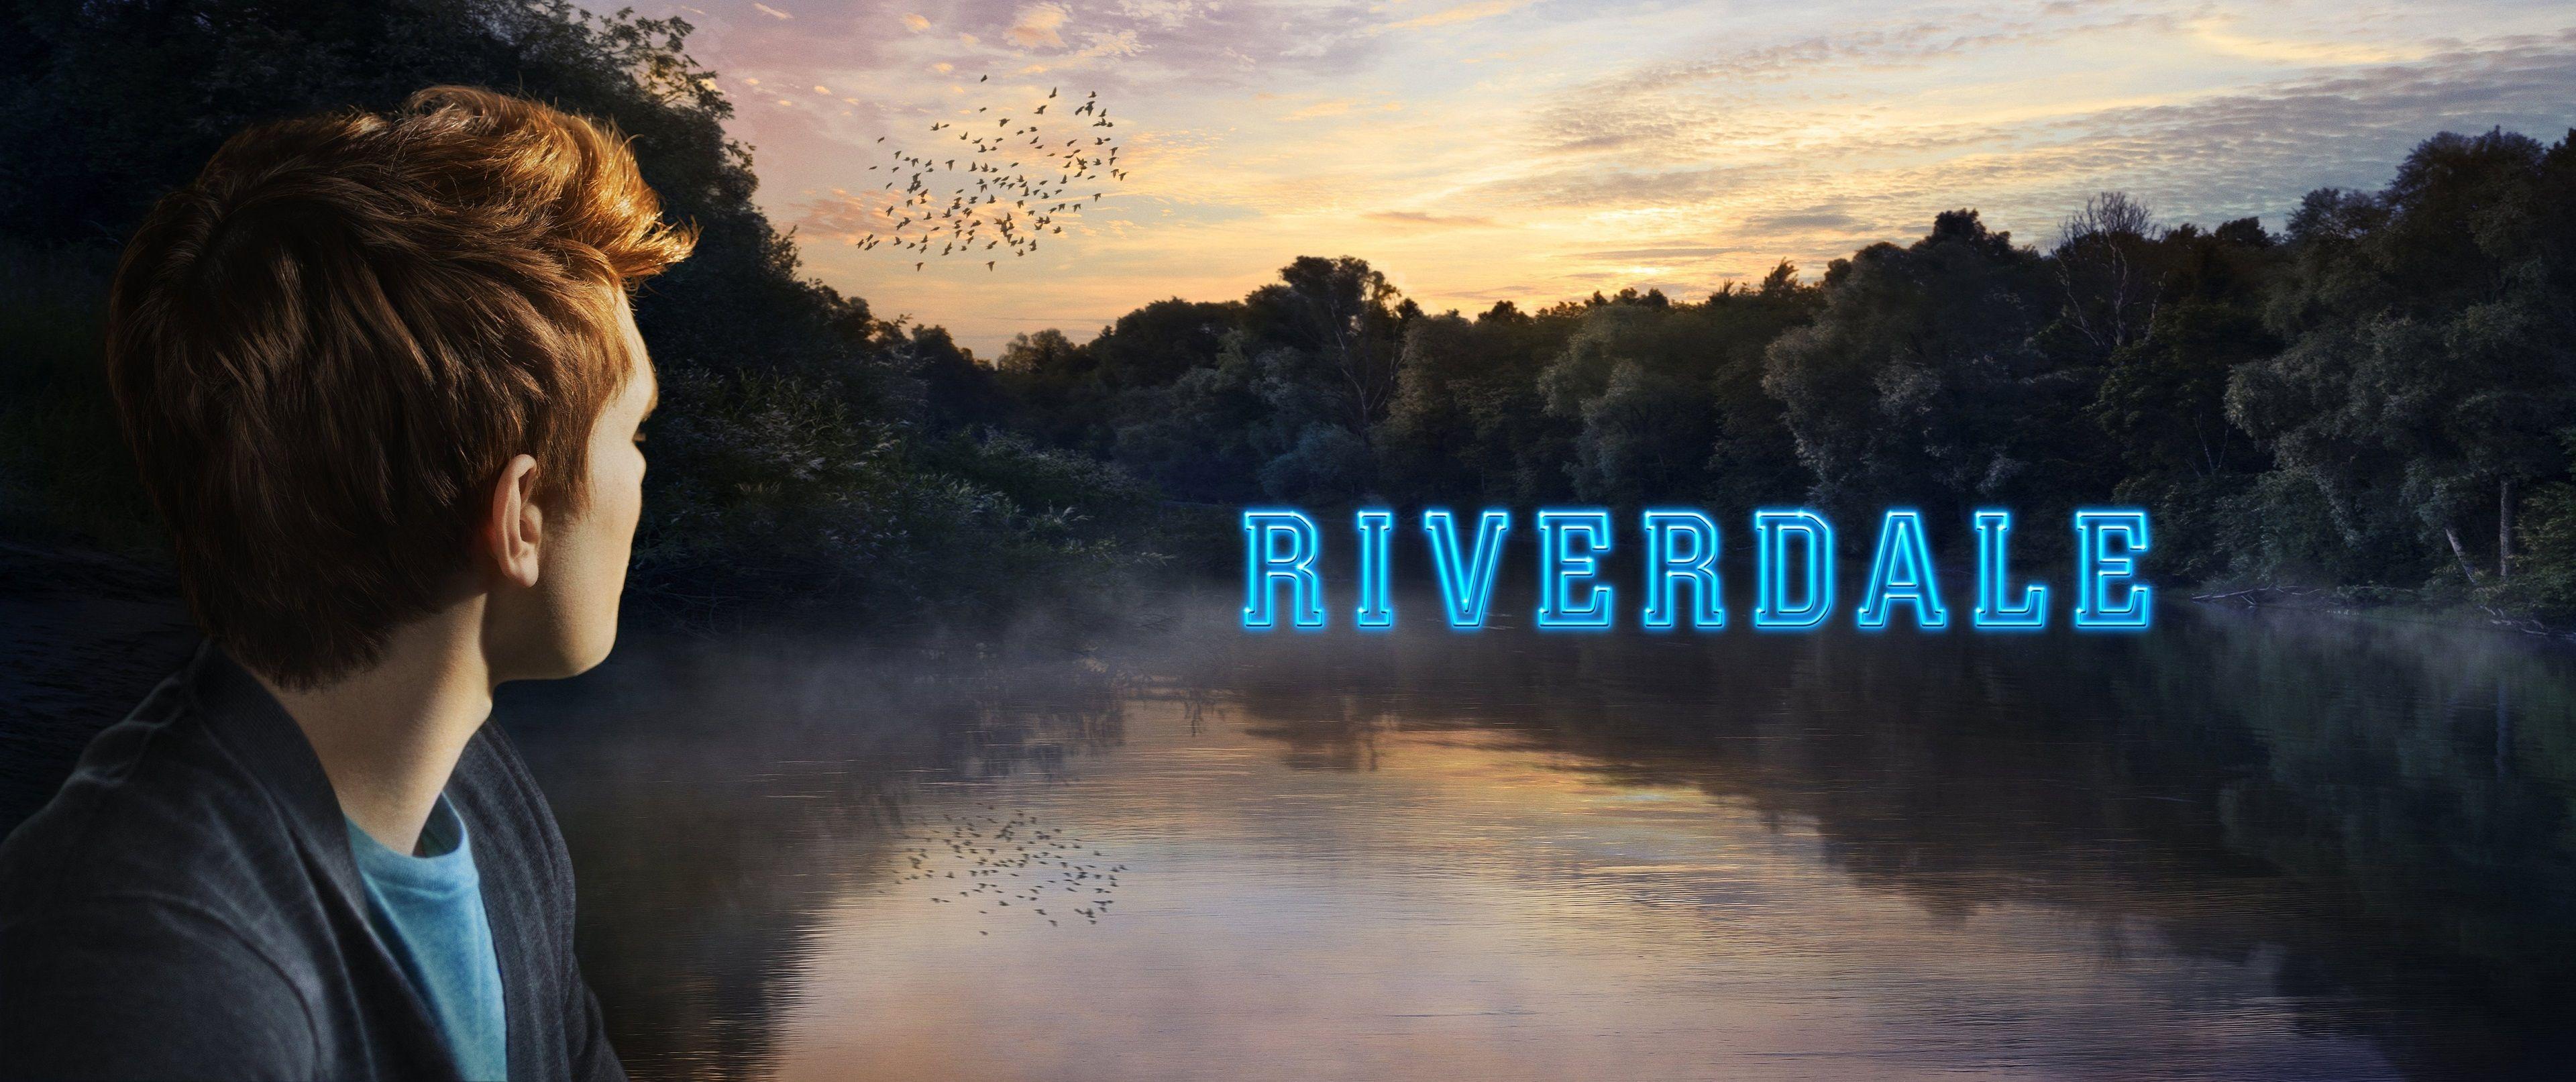 Riverdale Tumblr PC Wallpapers ...